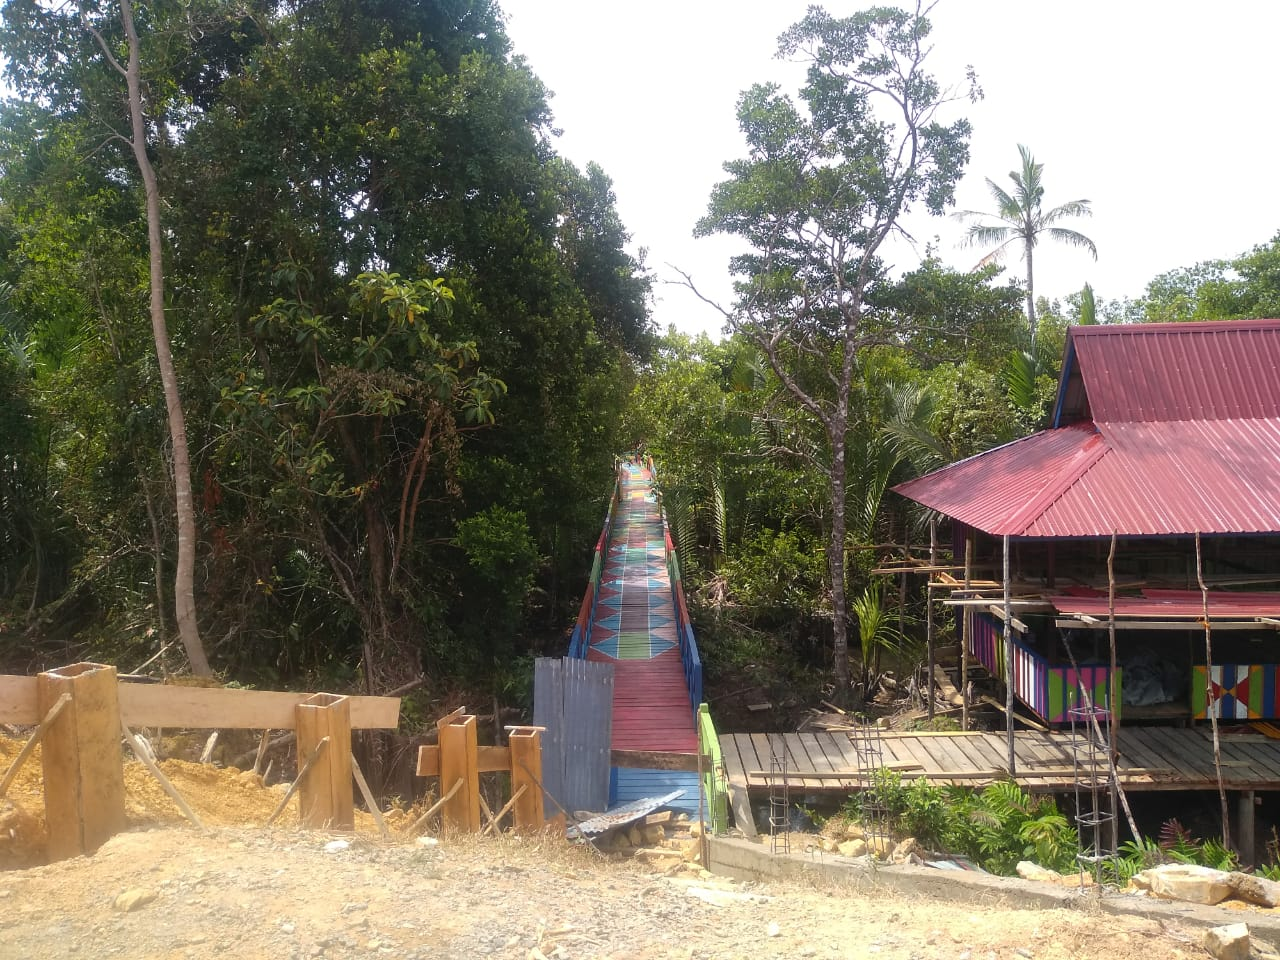 Termotivasi Dari Bahasa Menteri Pedesaan, Desa Kelumu Jadikan Hutan Mangrove Objek Wisata, Penangkaran Ketam dan Gonggong.